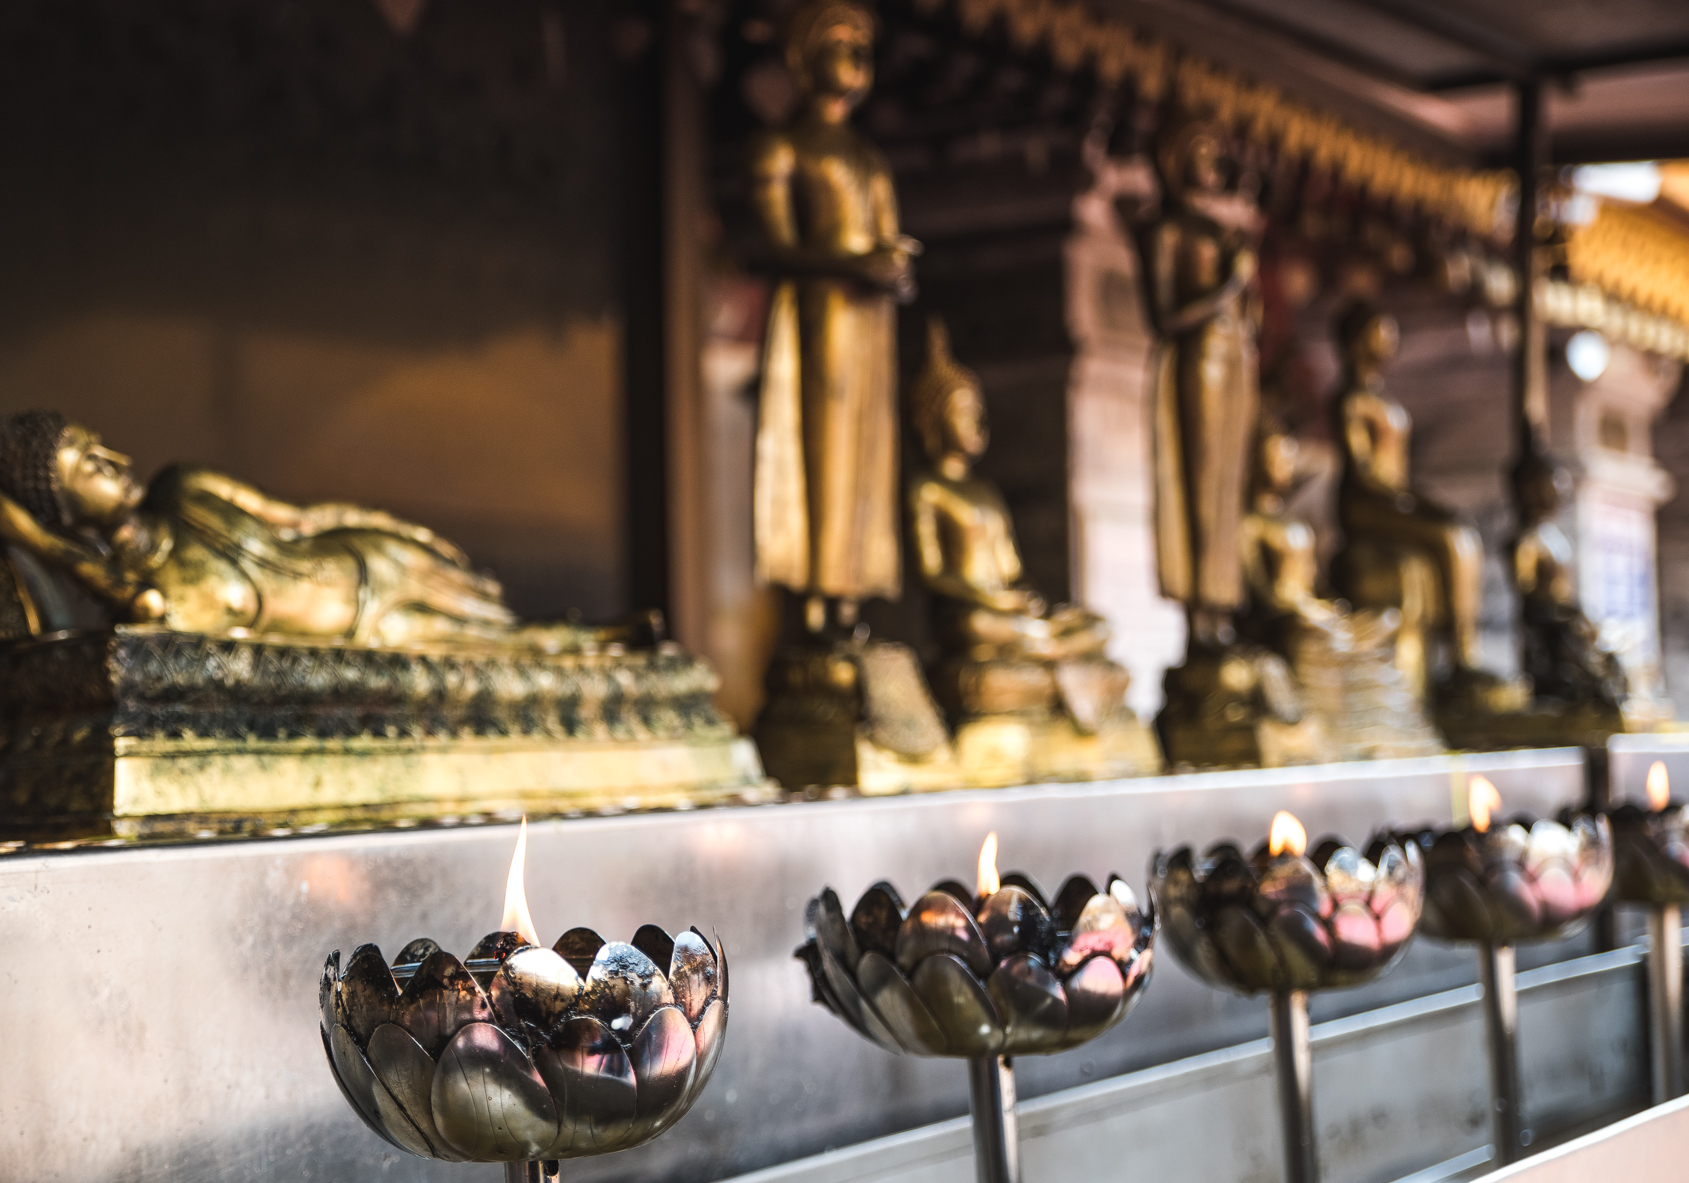 Ibrahim Badru Thailand eyeobee ART The Wandering eye_-40.jpg